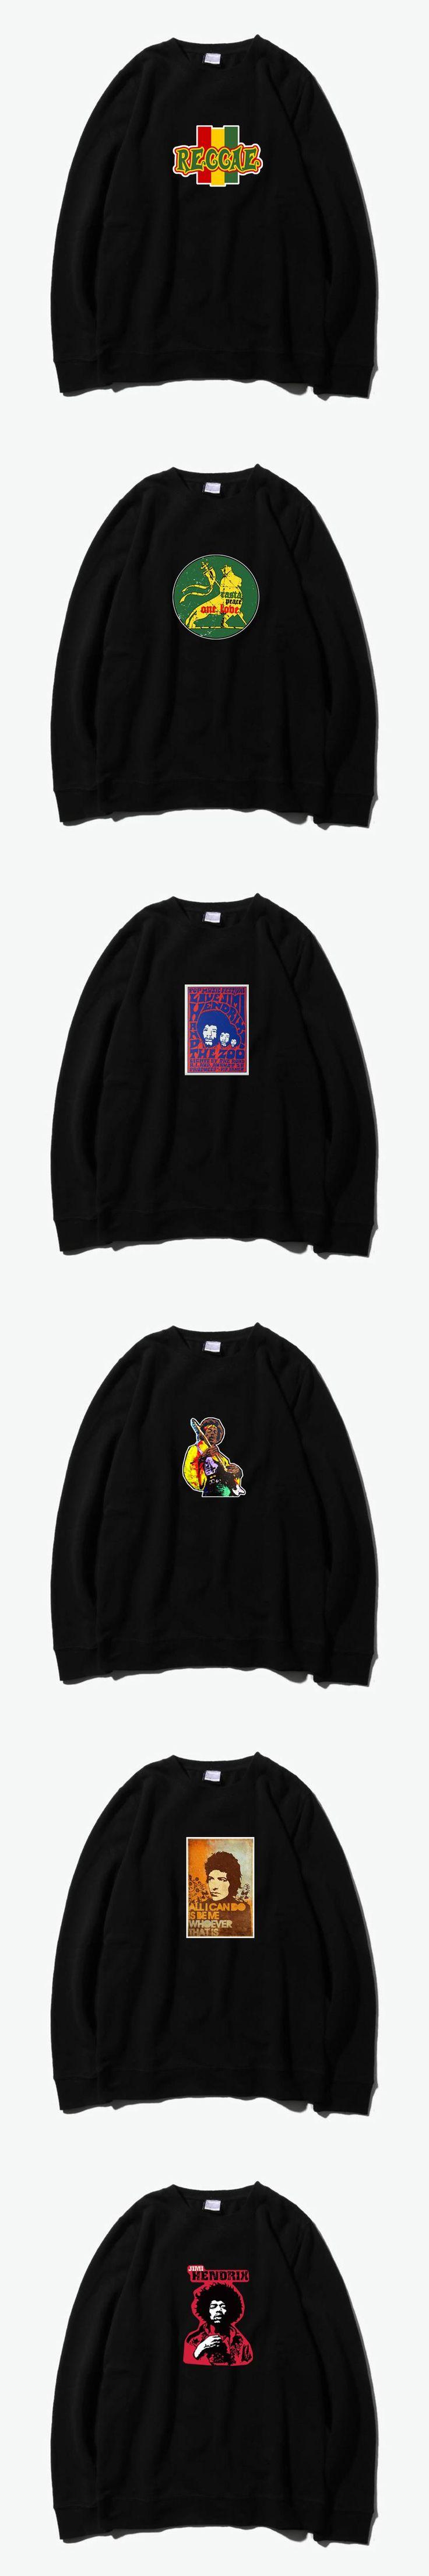 rasta lion from zion bob dylan jimi hendrix rock fashion sweatshirt hoodies